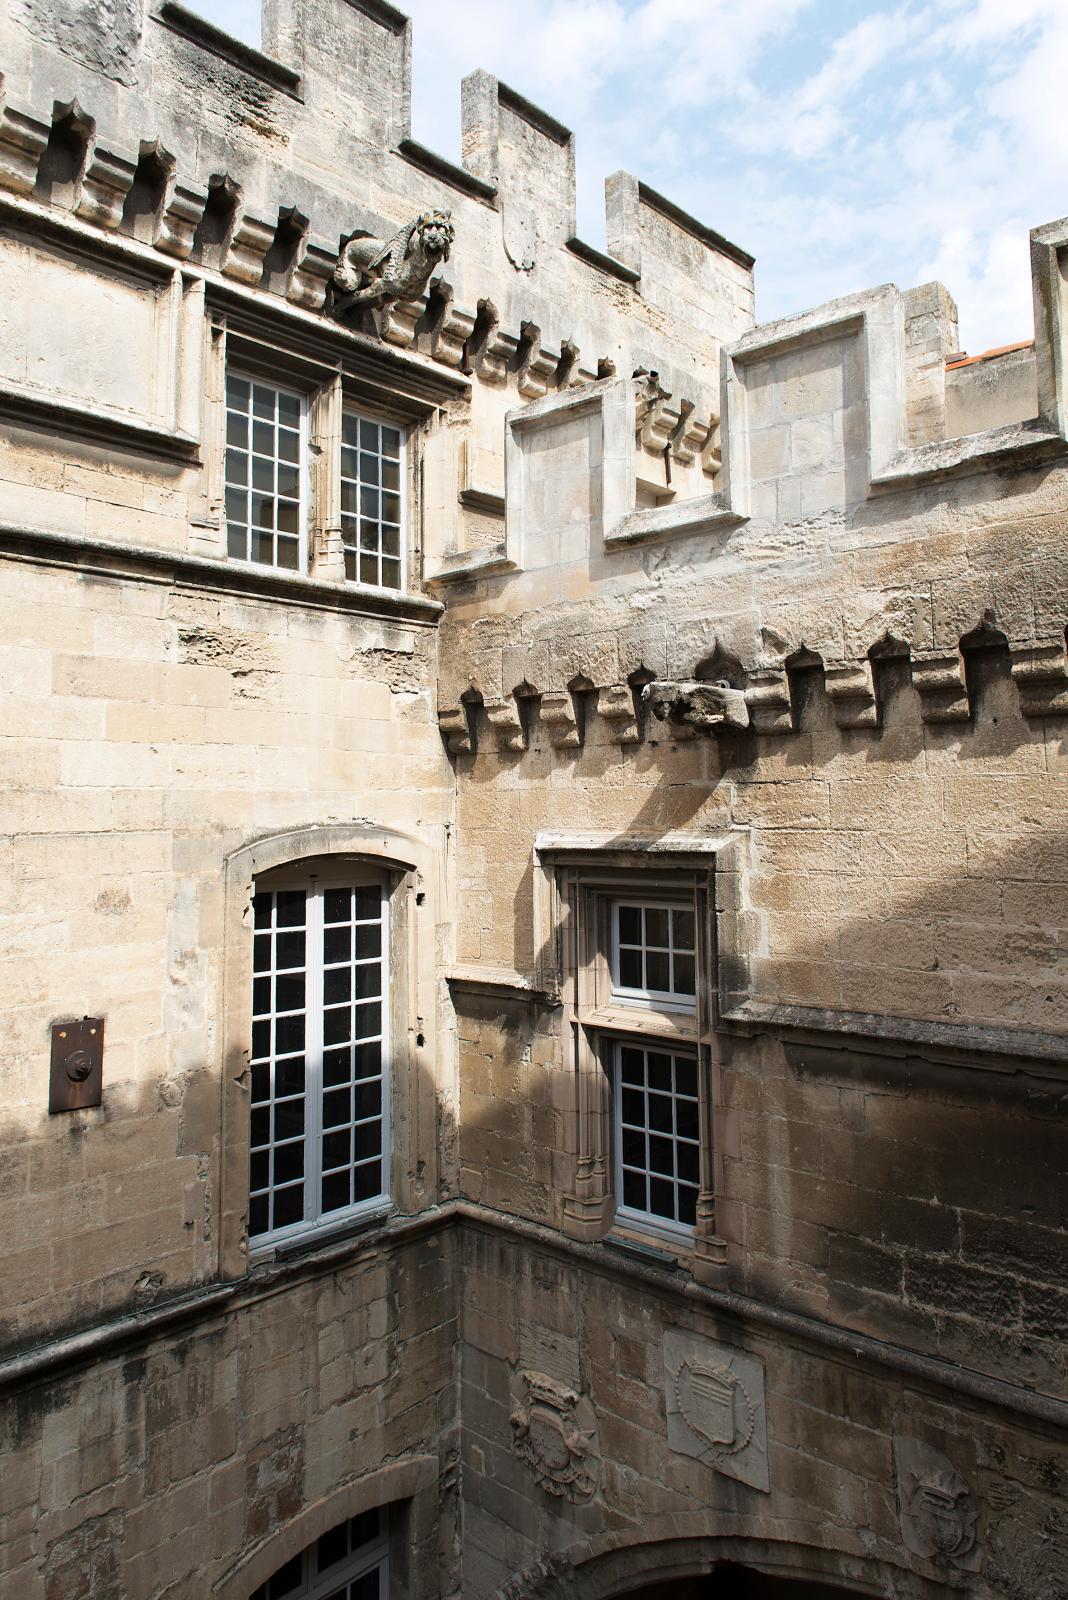 Musée Réattu, photo courtesy of the Musée Réattu